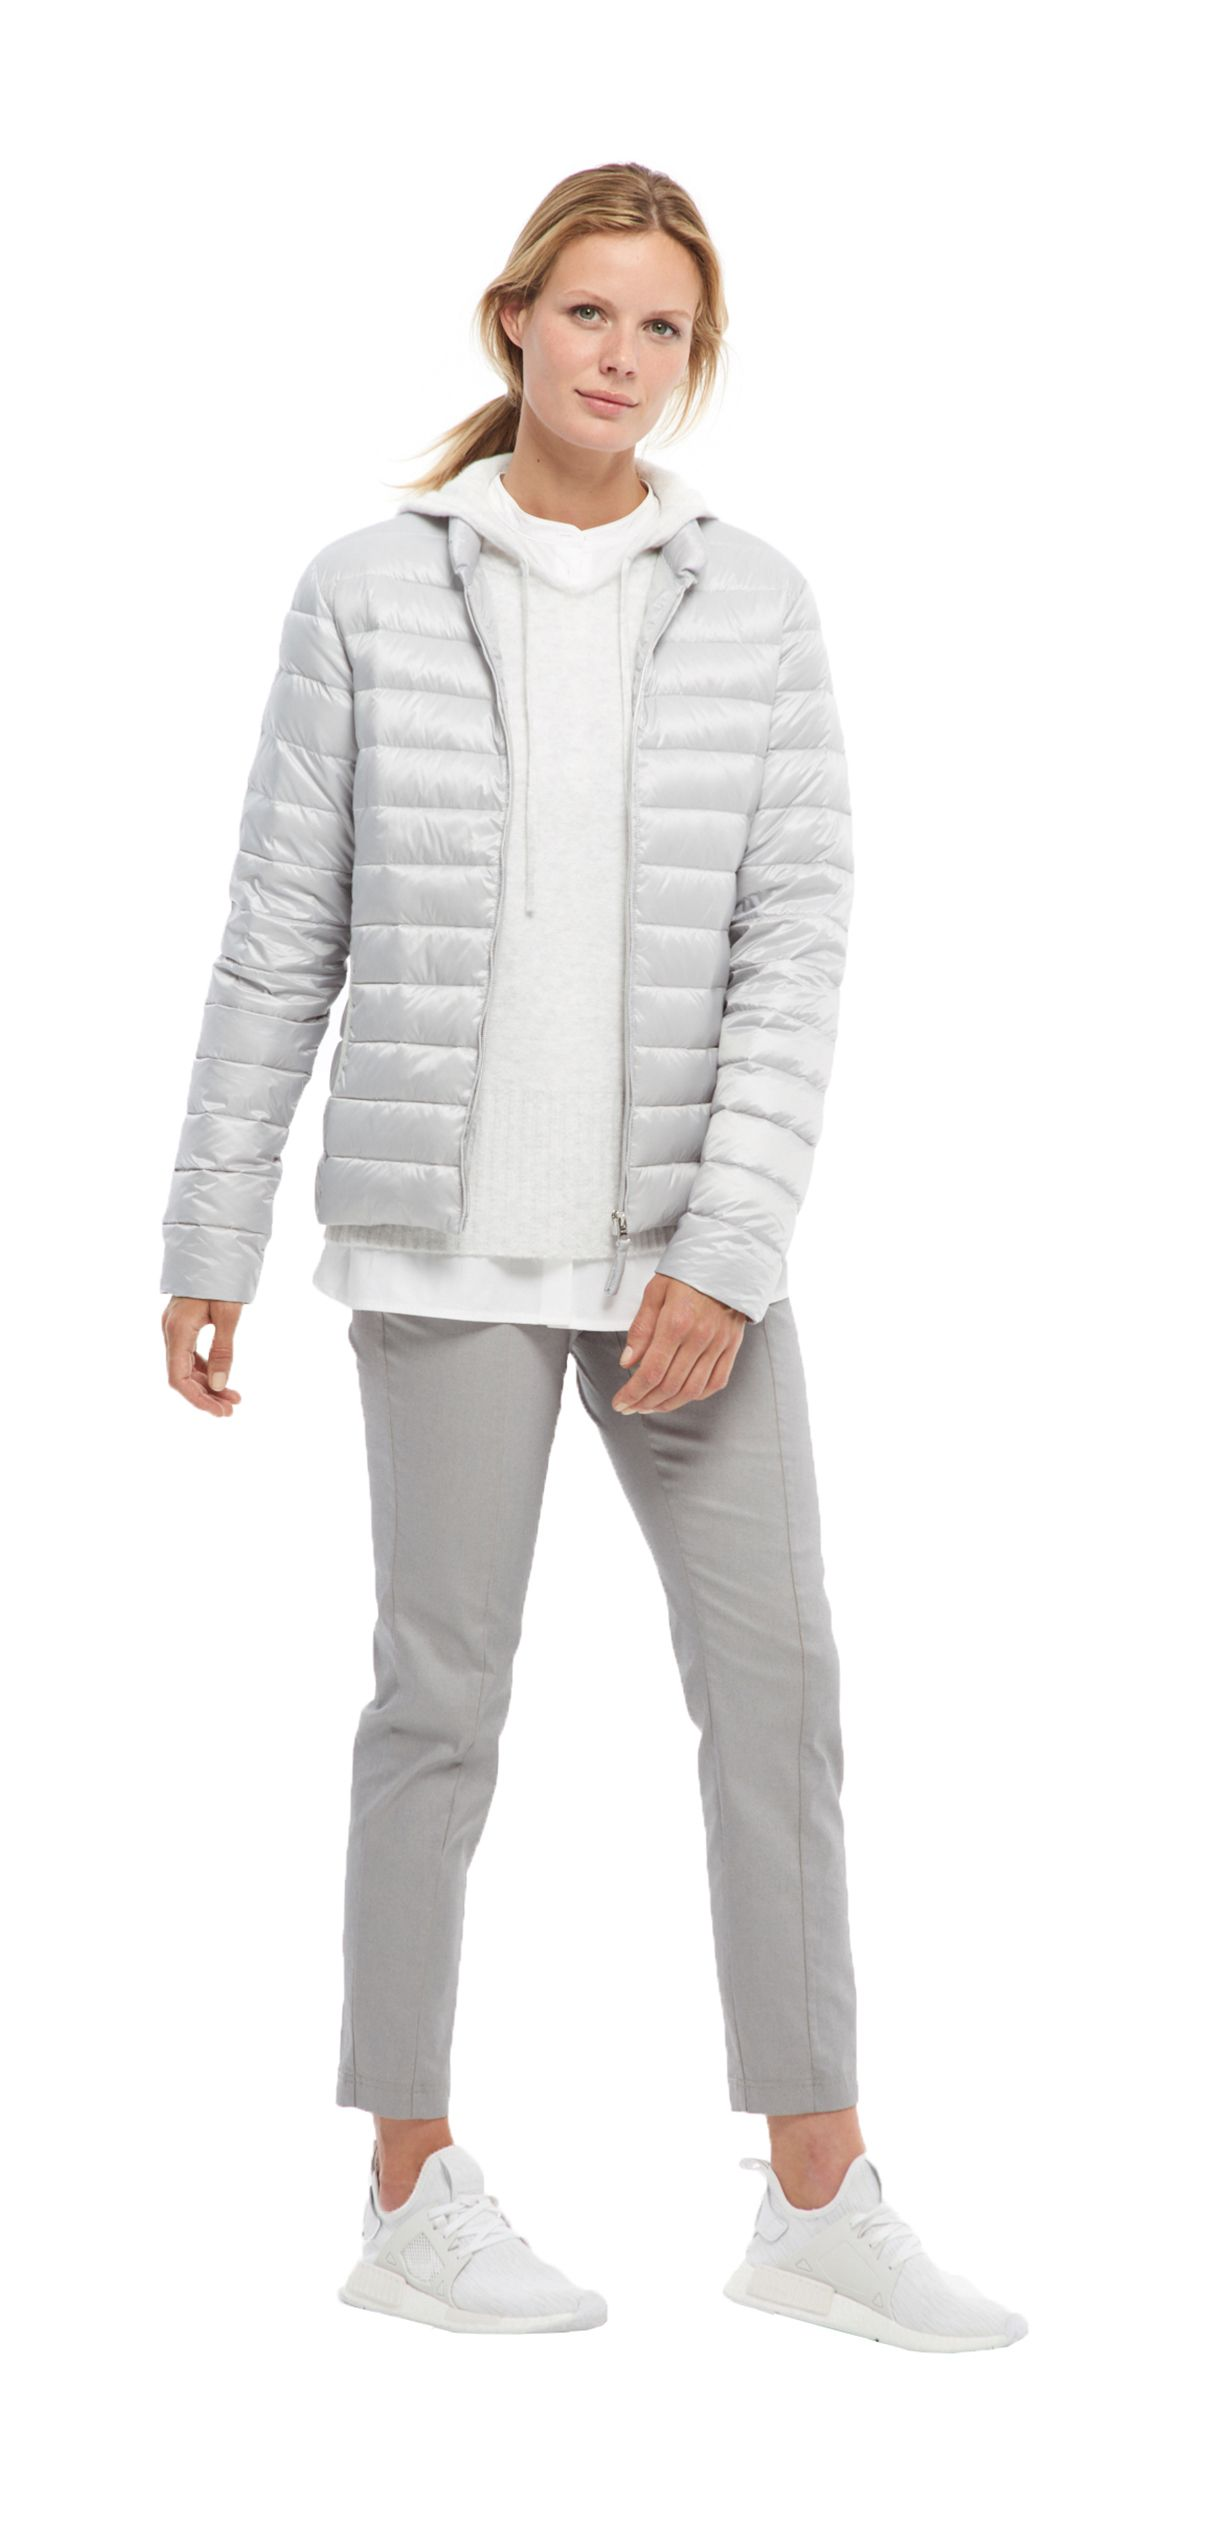 Fall Winter Collection 2017 | Mode, Kleidung online kaufen ...